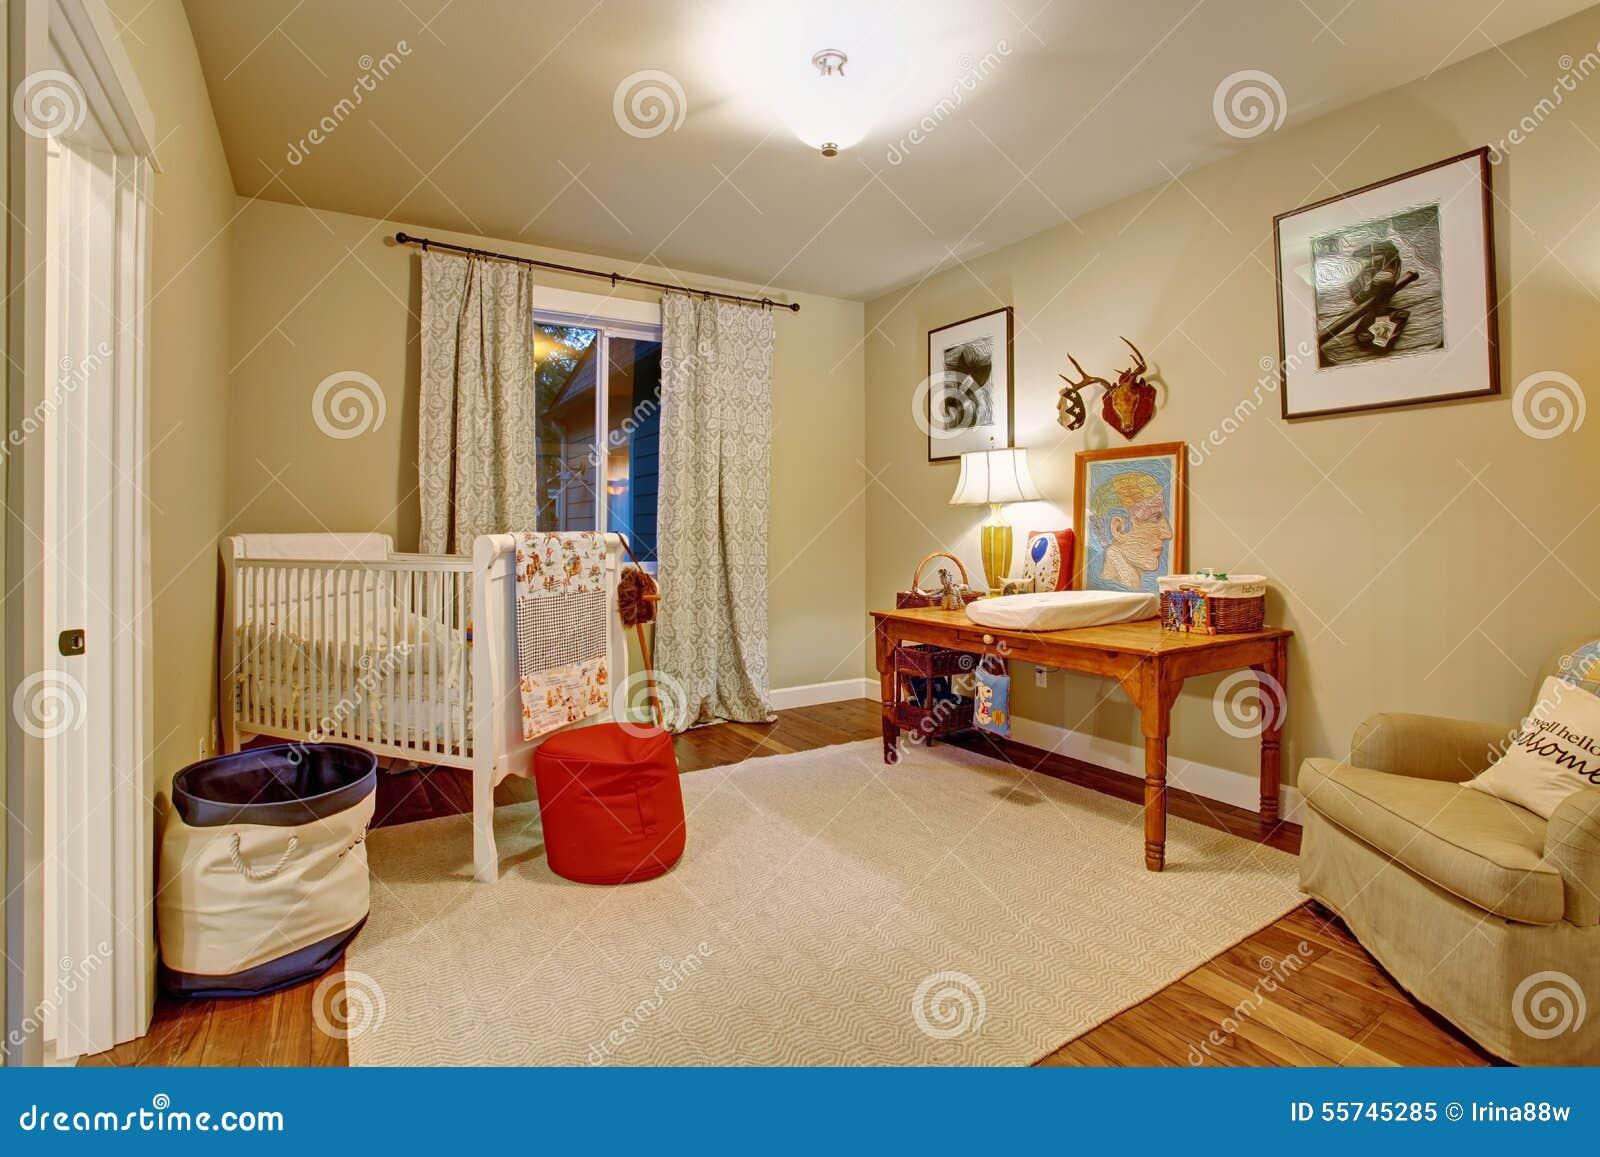 Nice baby room with hardwood floor.